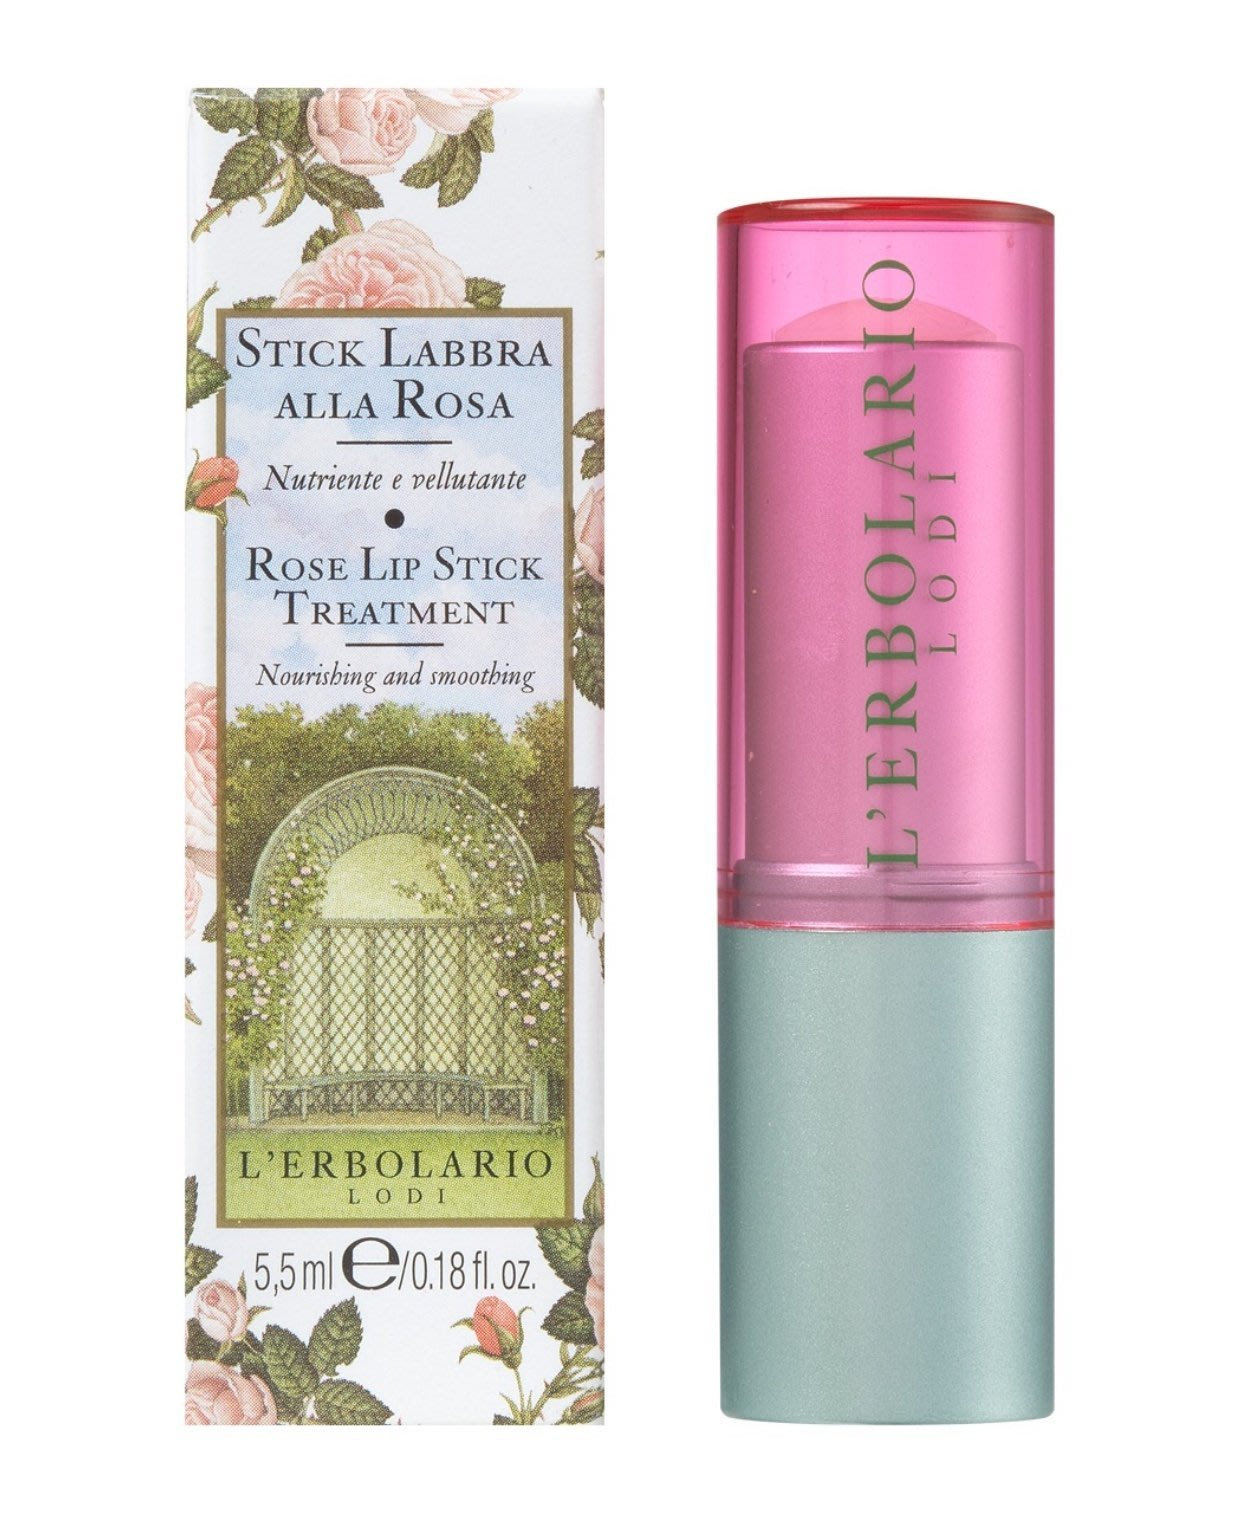 蕾莉歐 L'ERBOLARIO 玫瑰保濕護唇膏 5.5ml ~ 高市可面交